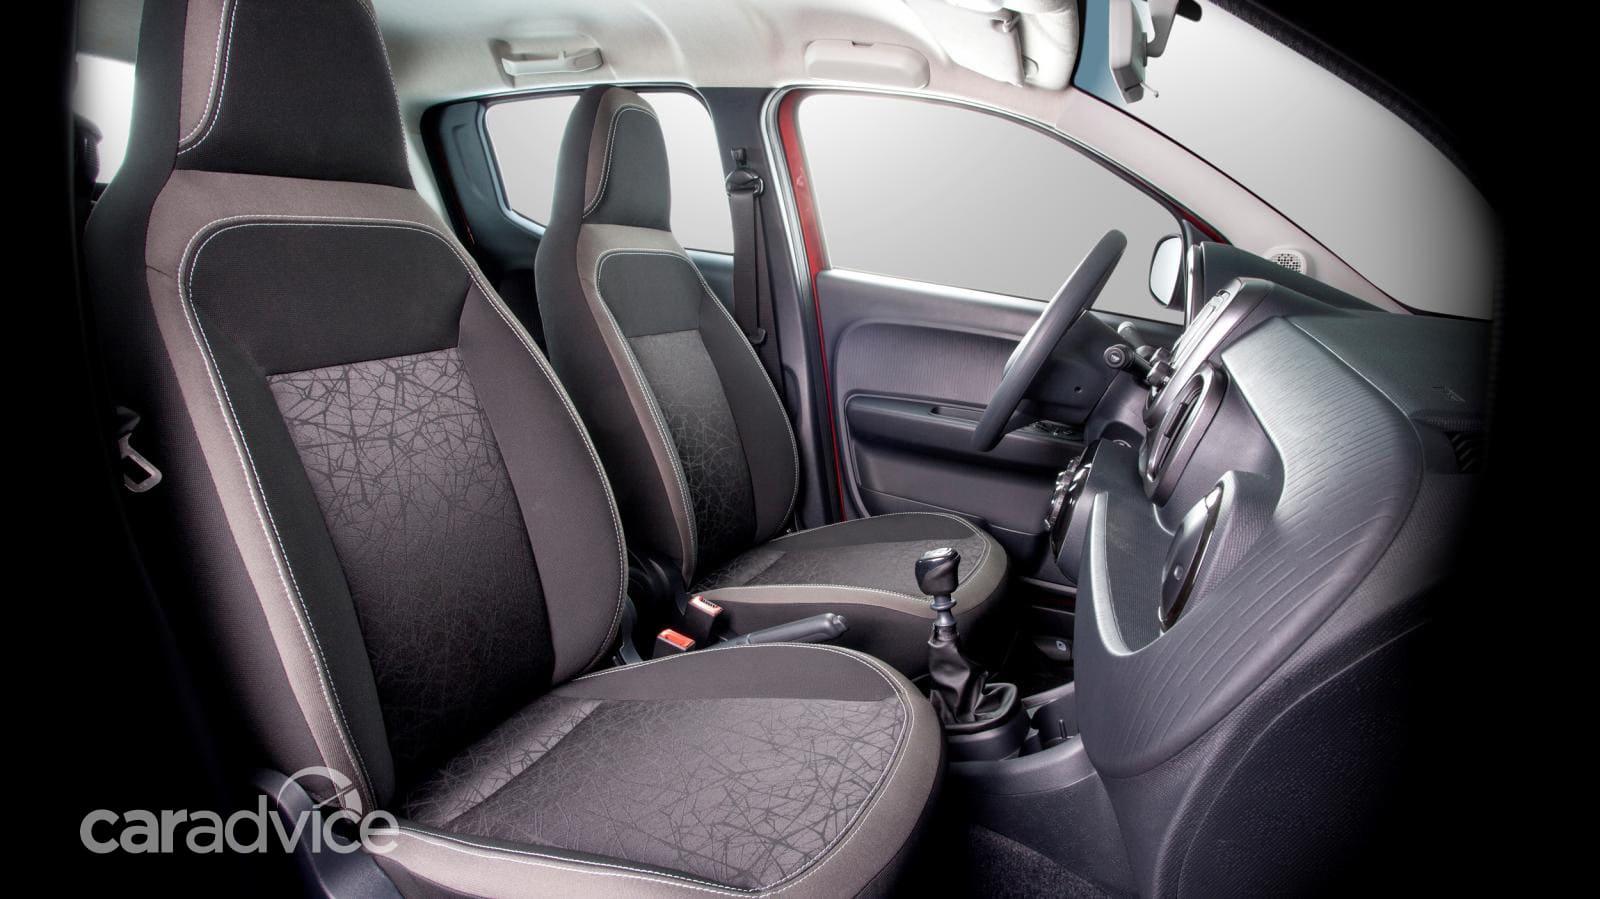 Datsun redi go seat cover anker powercore 20100 flashing light